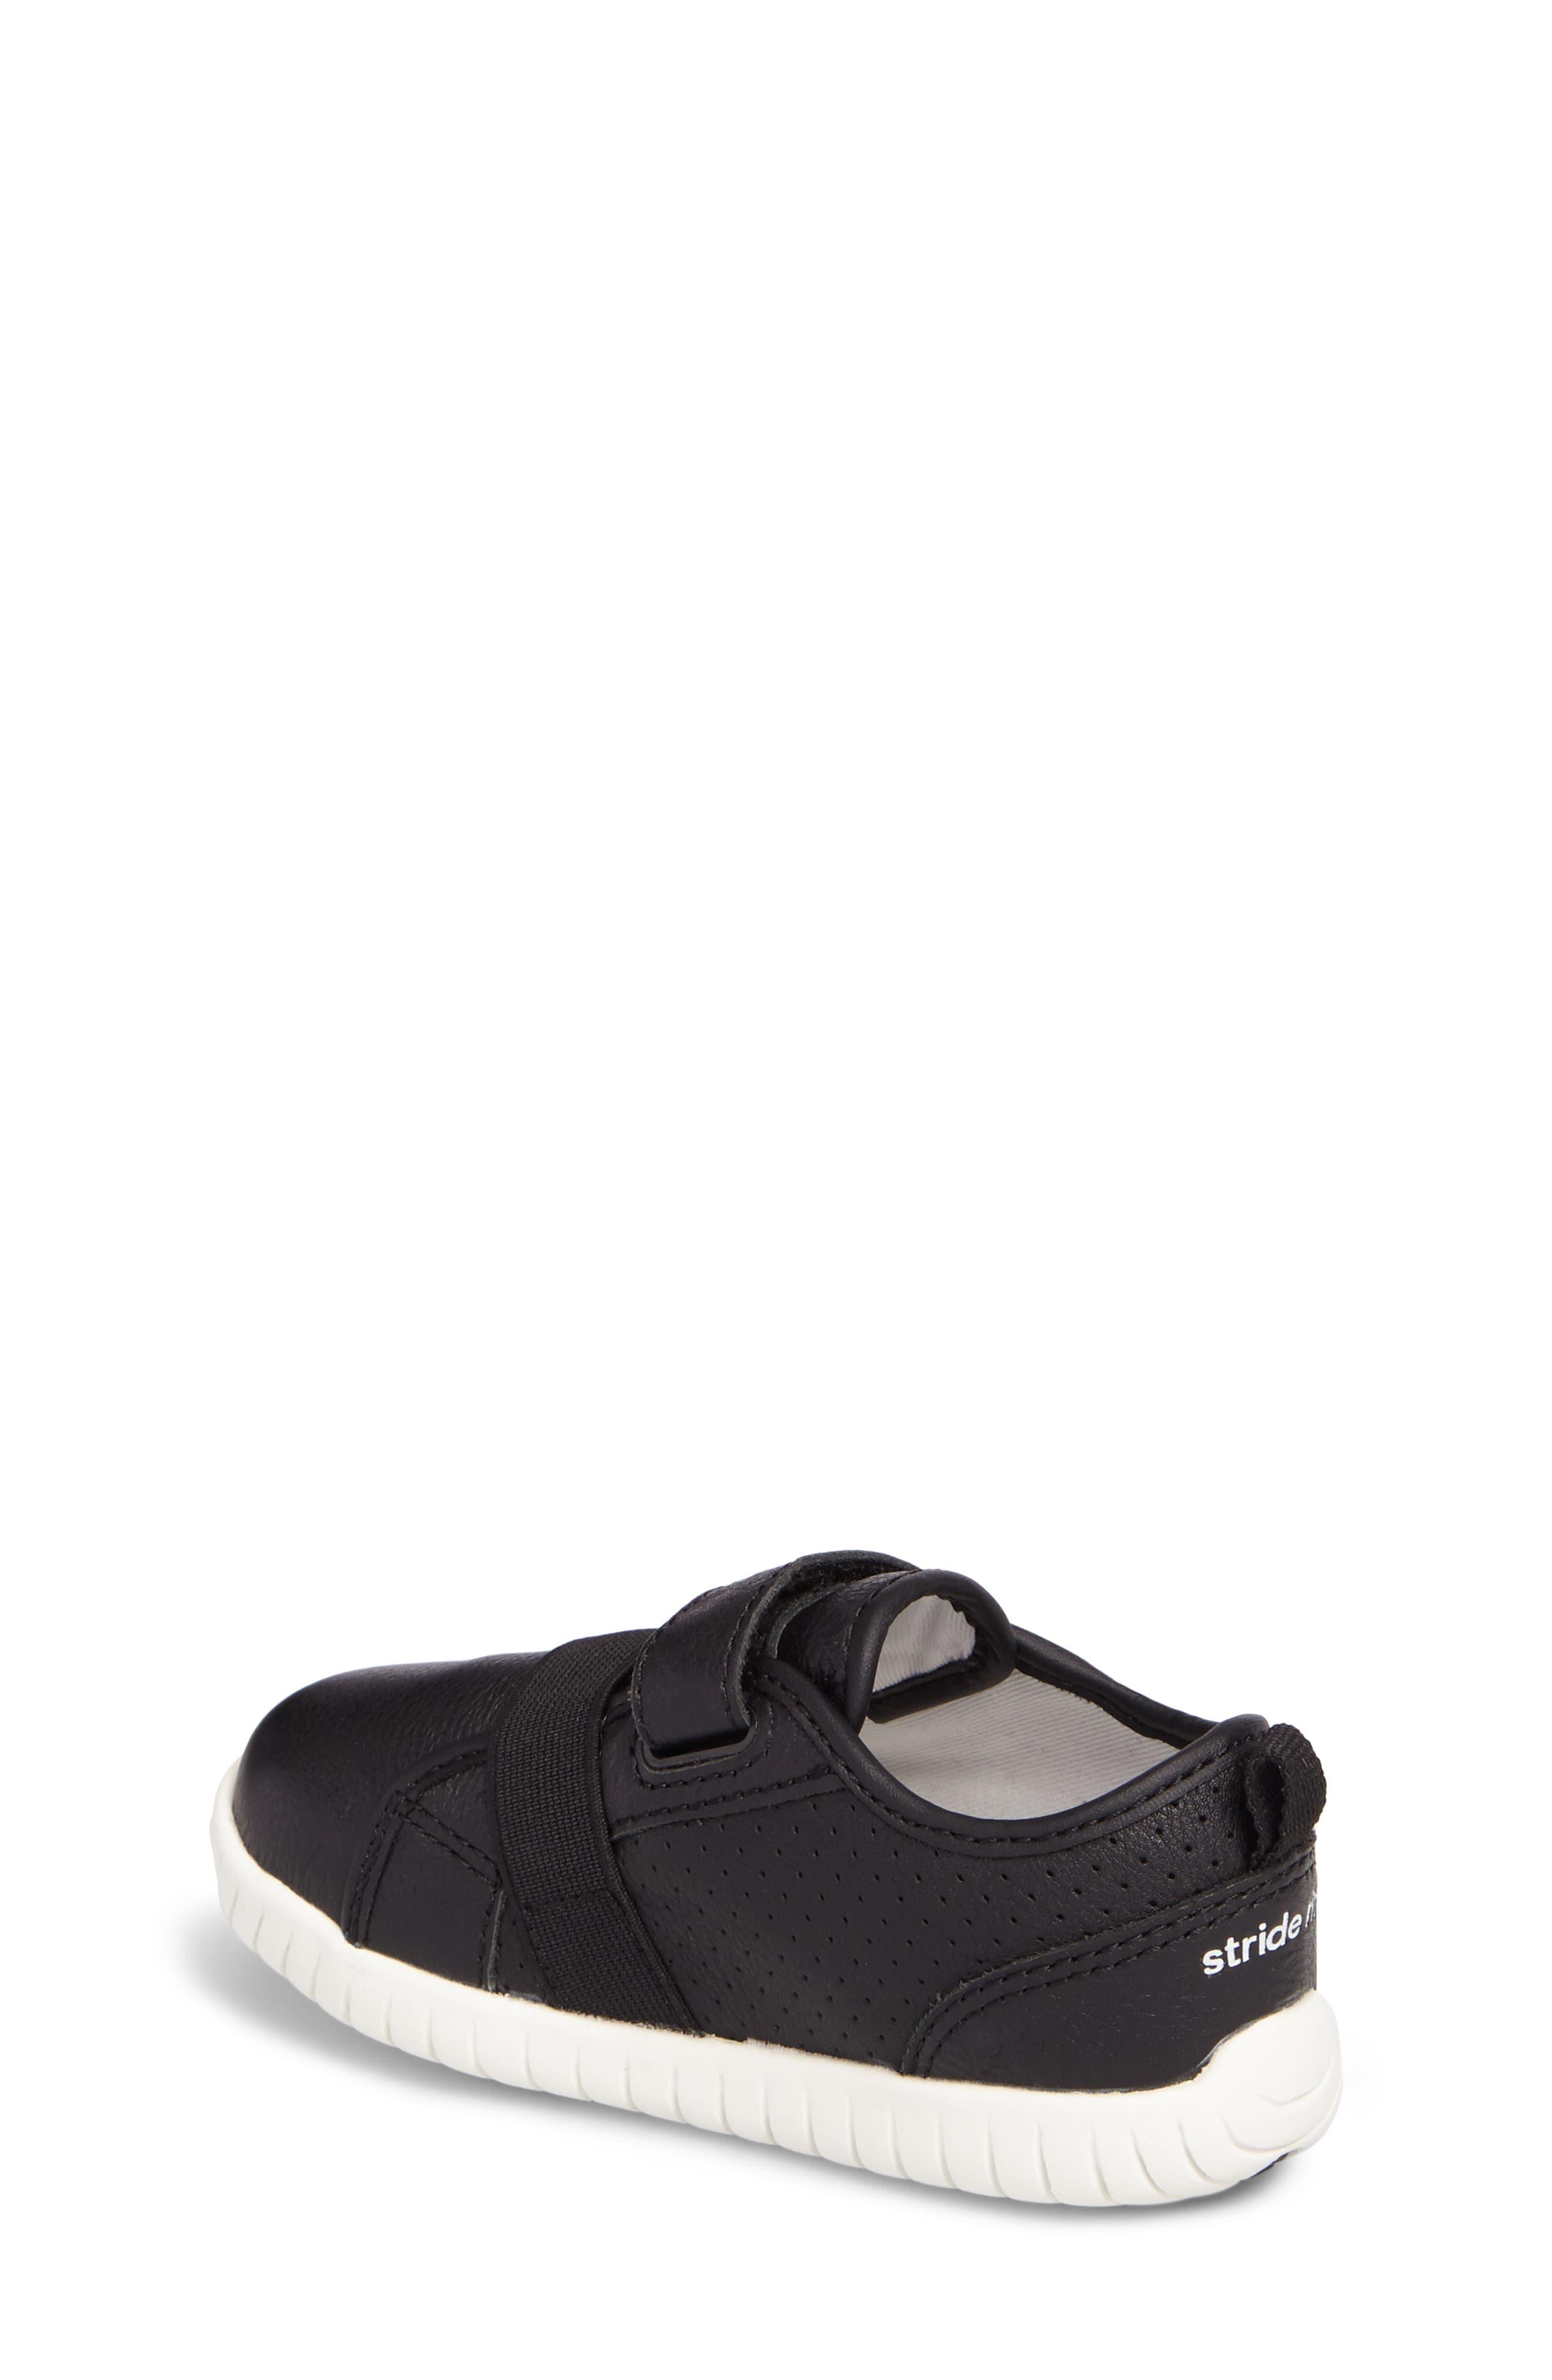 SRT Riley Sneaker,                             Alternate thumbnail 2, color,                             Black Leather